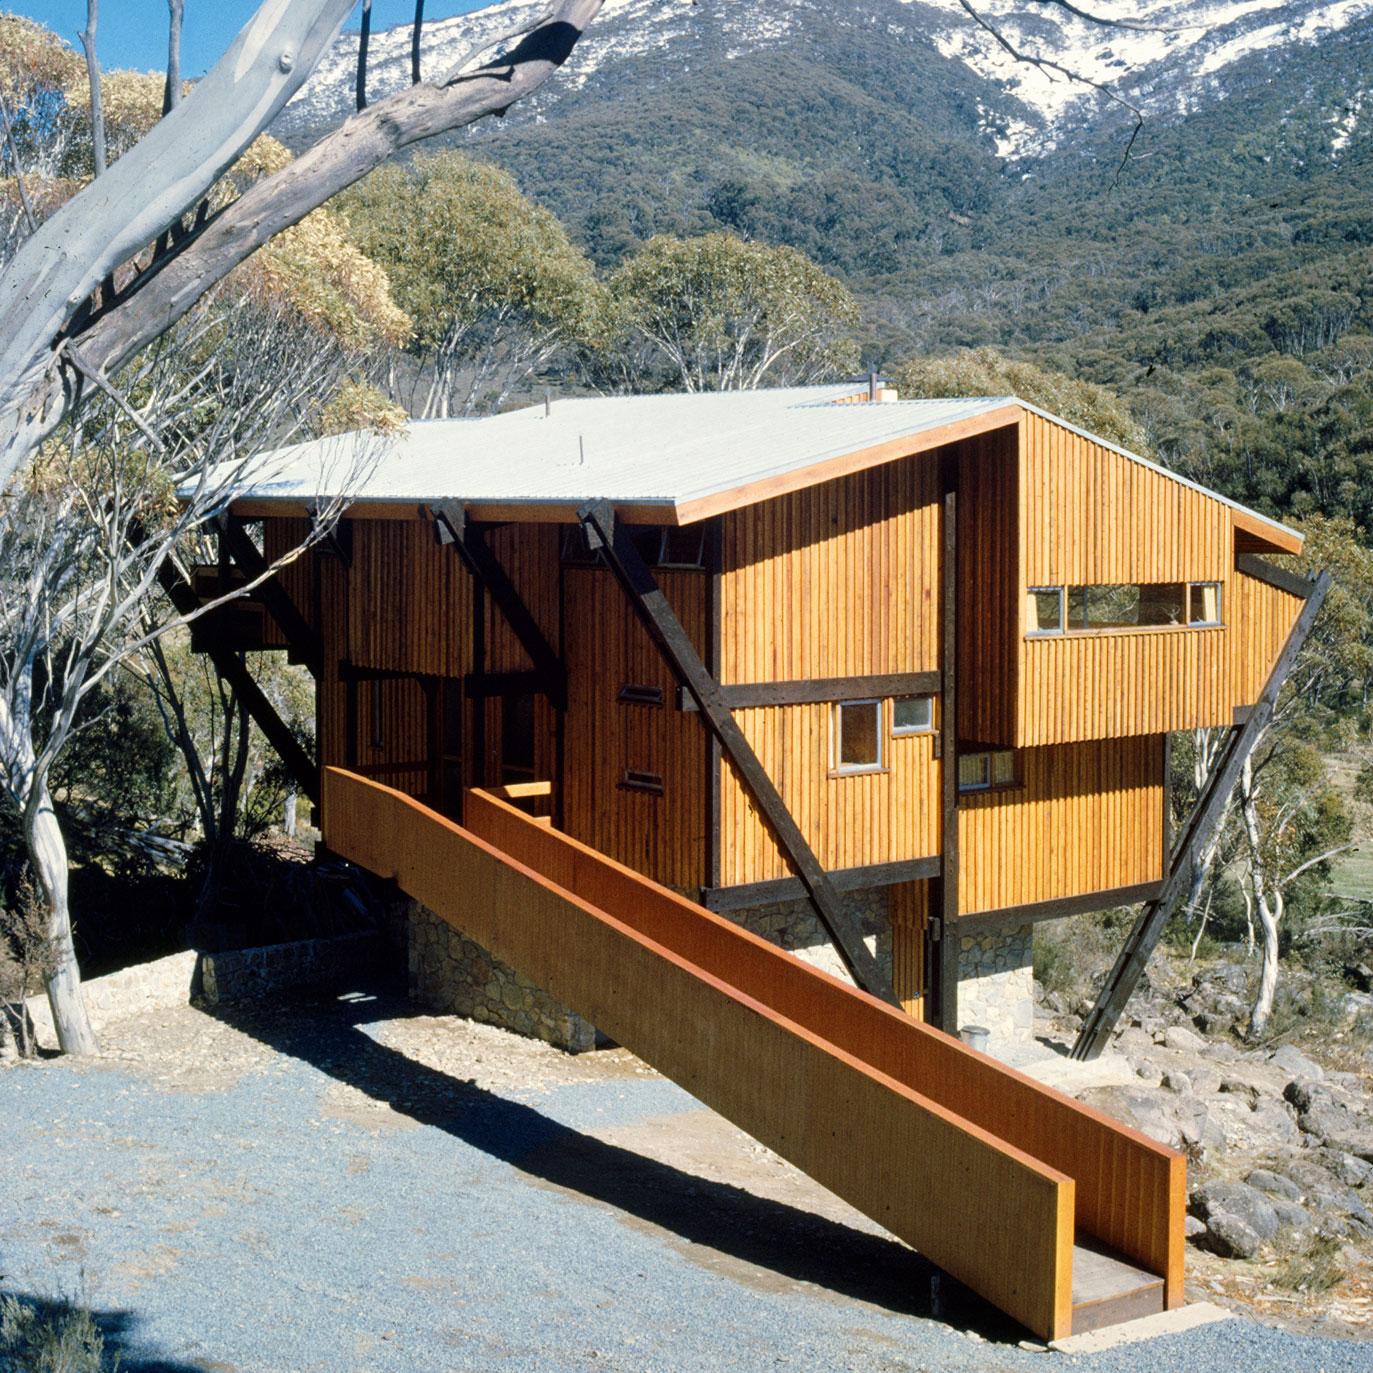 Thredbo Ski Lodge, Harry Seidler, Thredbo, New South Wales (AU), 1962. From the Atlas of Mid-Century Modern Houses - Photo Max Dupain © Penelope Seidler